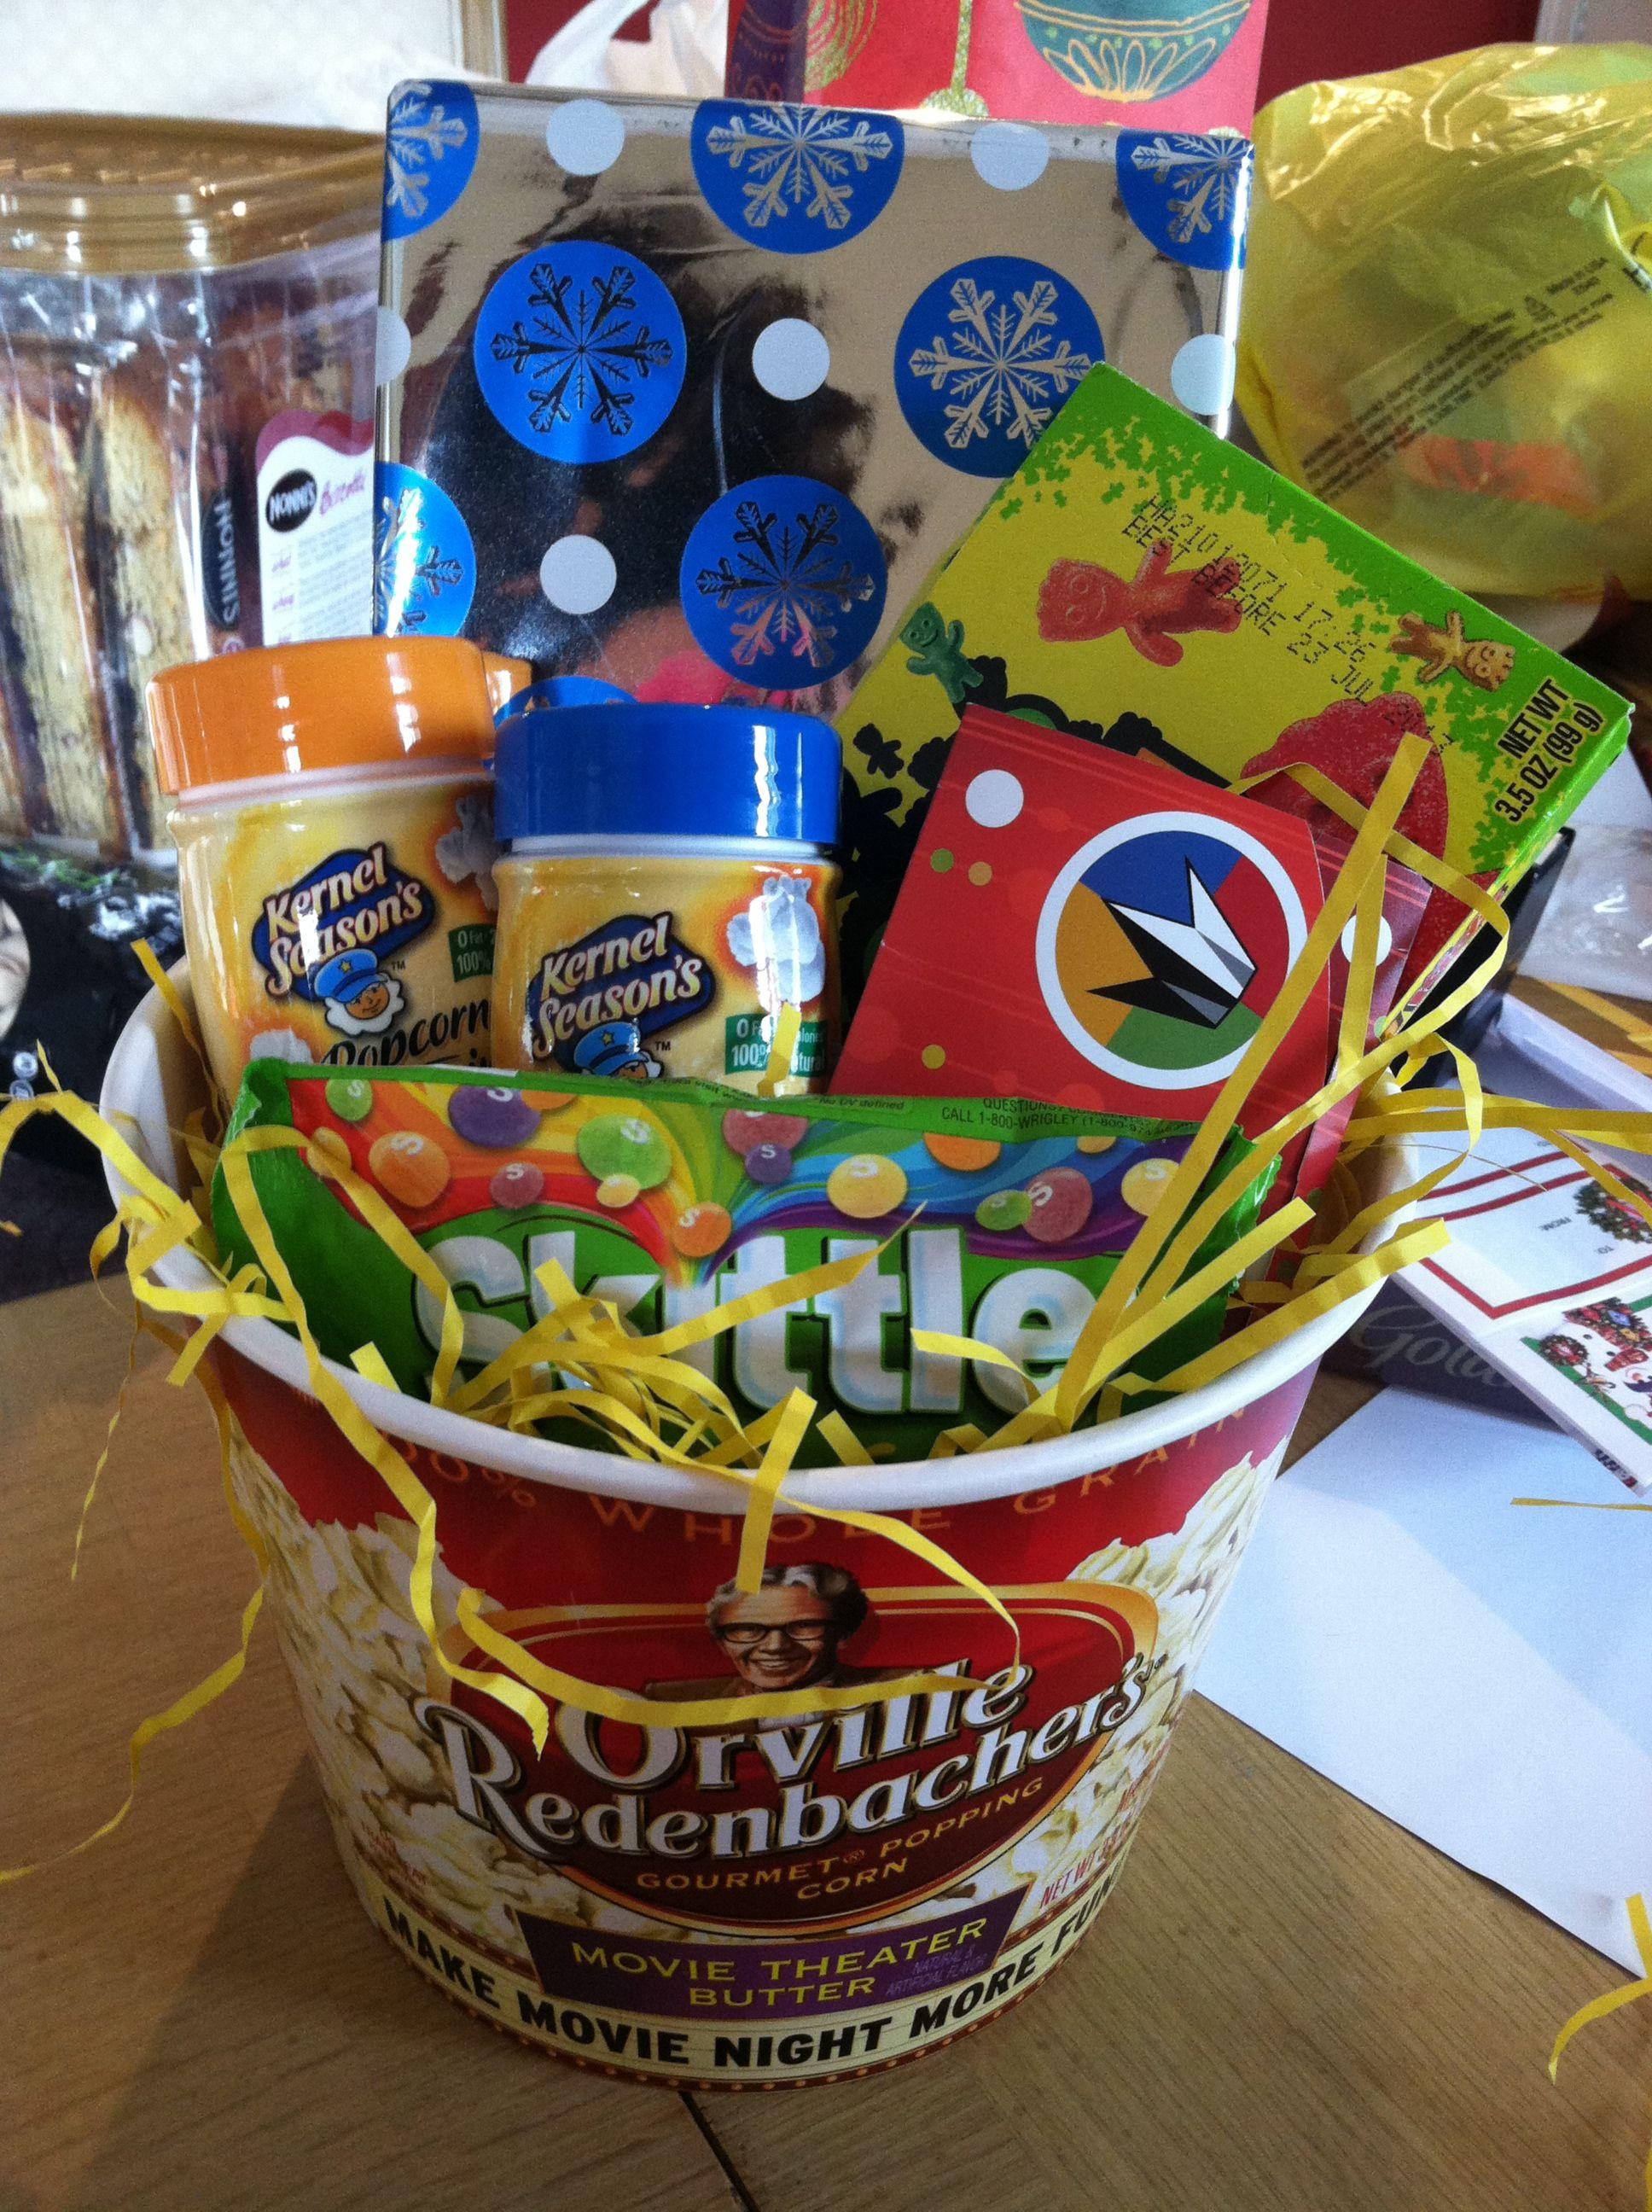 Popcorn Gift Baskets Ideas  Movie Gift Basket Orville popcorn bucket from Tar